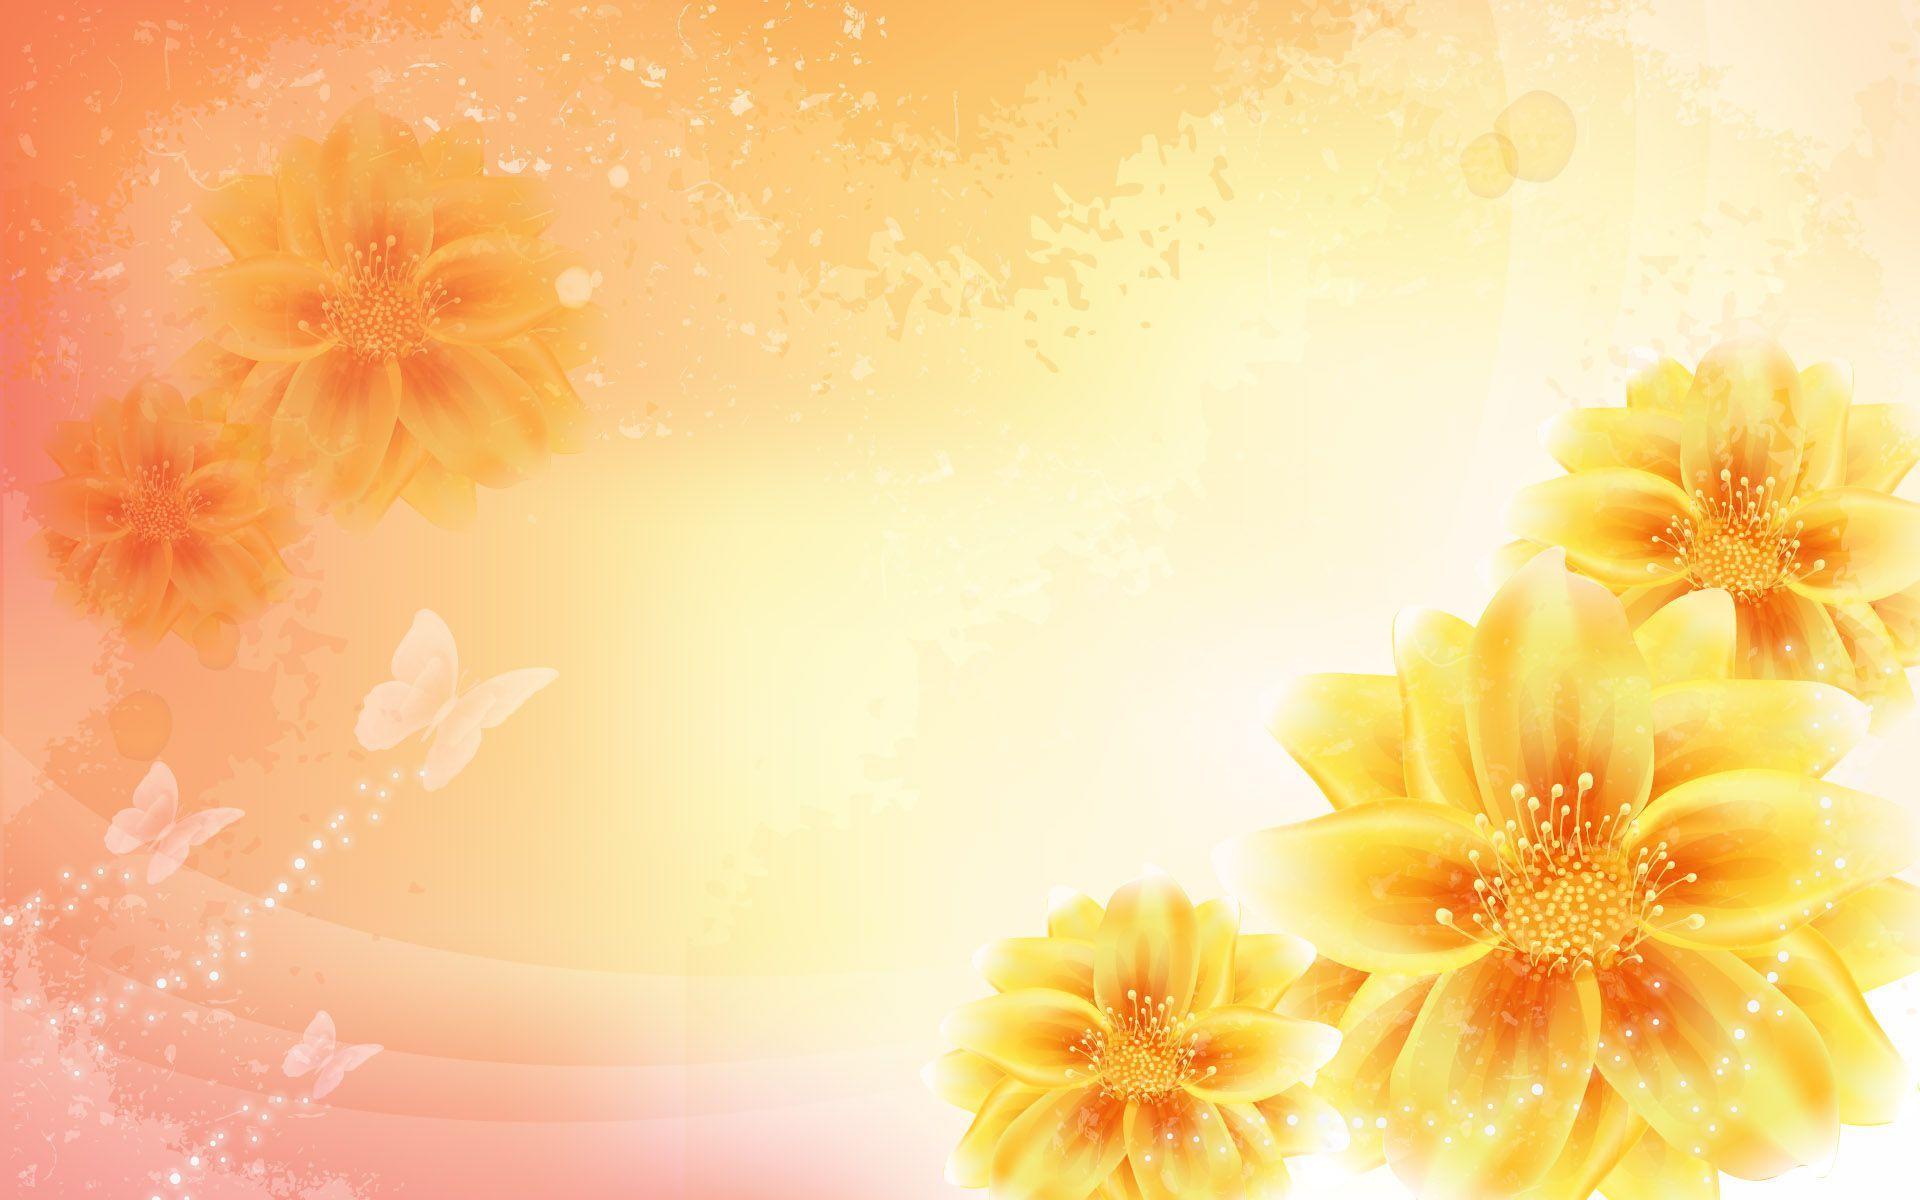 yellow-flower-background-wallpaper-3.jpg (1920×1200) | Backgrounds ... for Light Orange Background Wallpaper  239wja